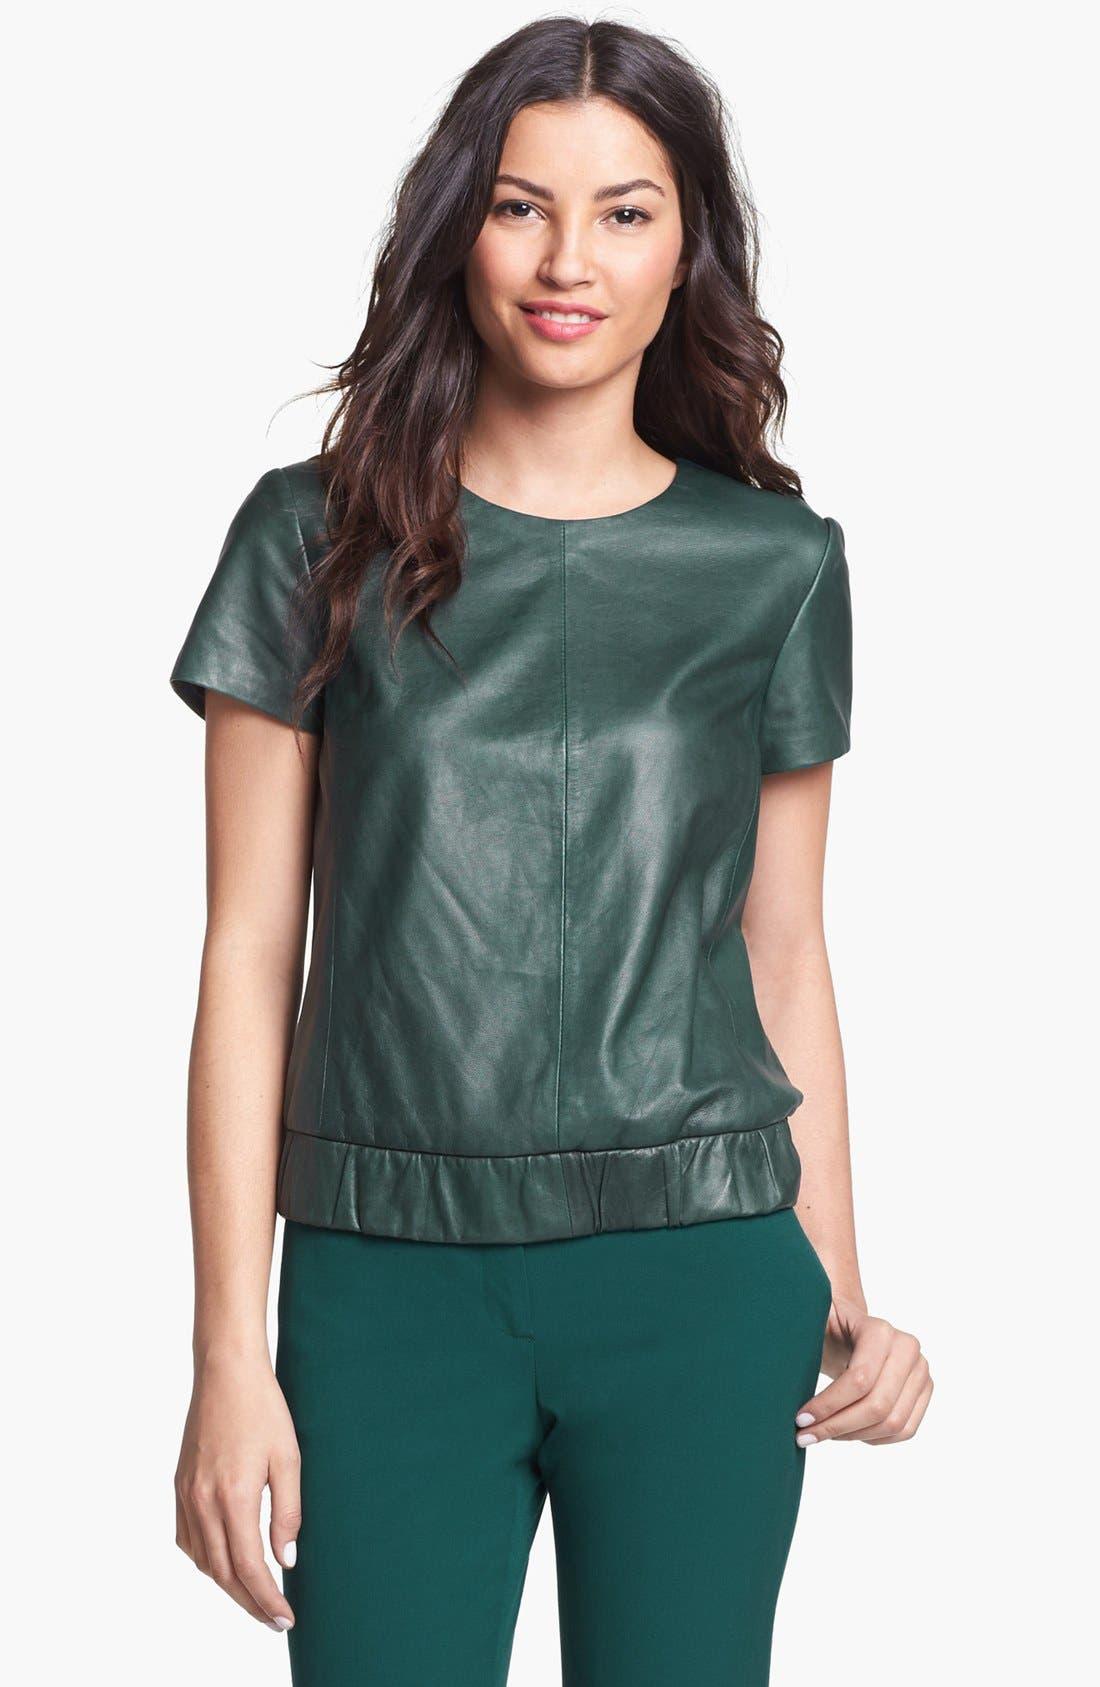 Main Image - Halogen® Leather Front Elastic Waist Top